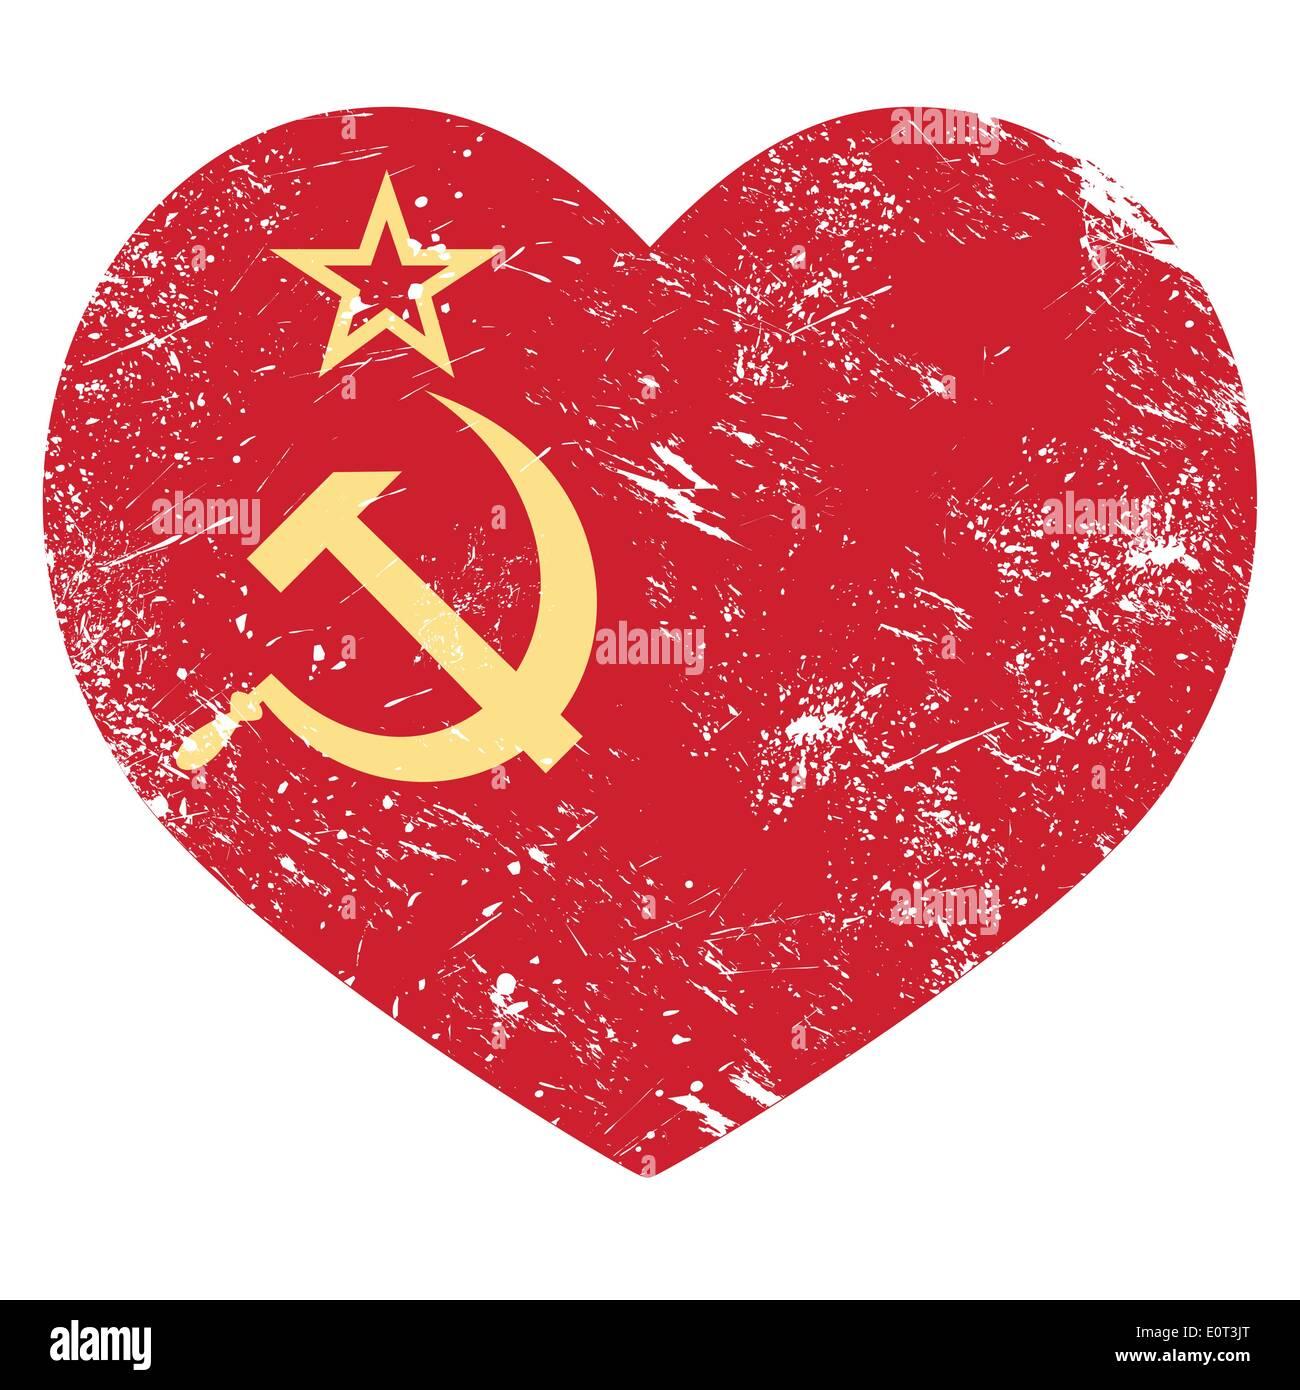 Communism USSR - Soviet union retro heart flag - Stock Image